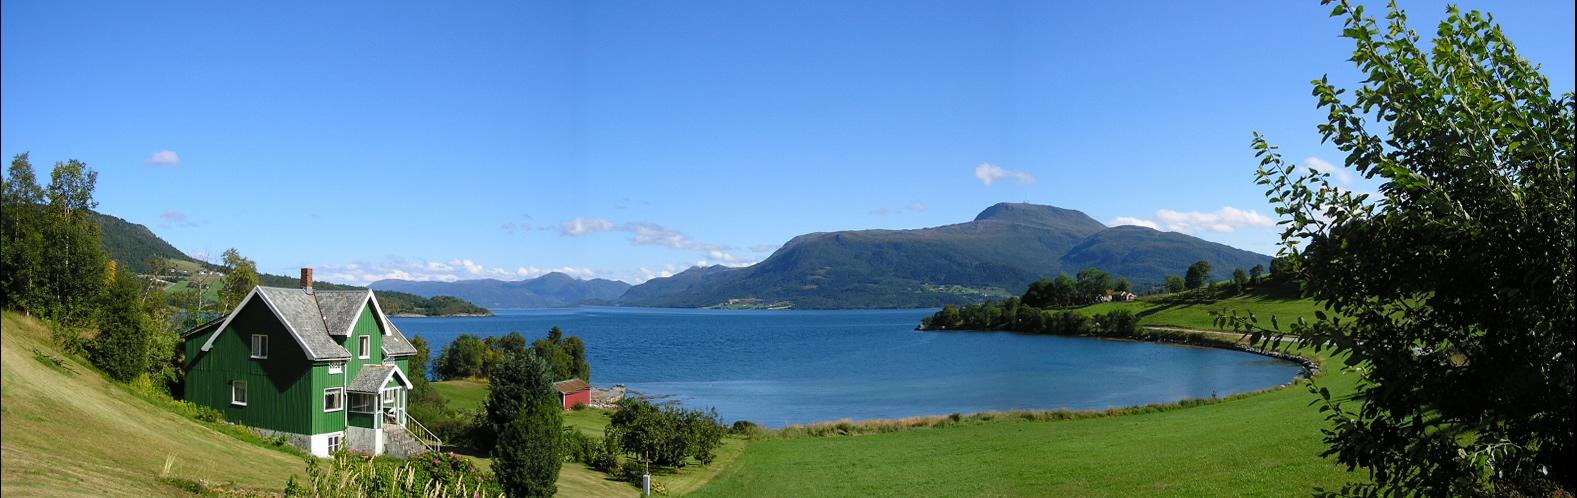 7. Panorama de un fiordo desde la orilla. Autor, Willem